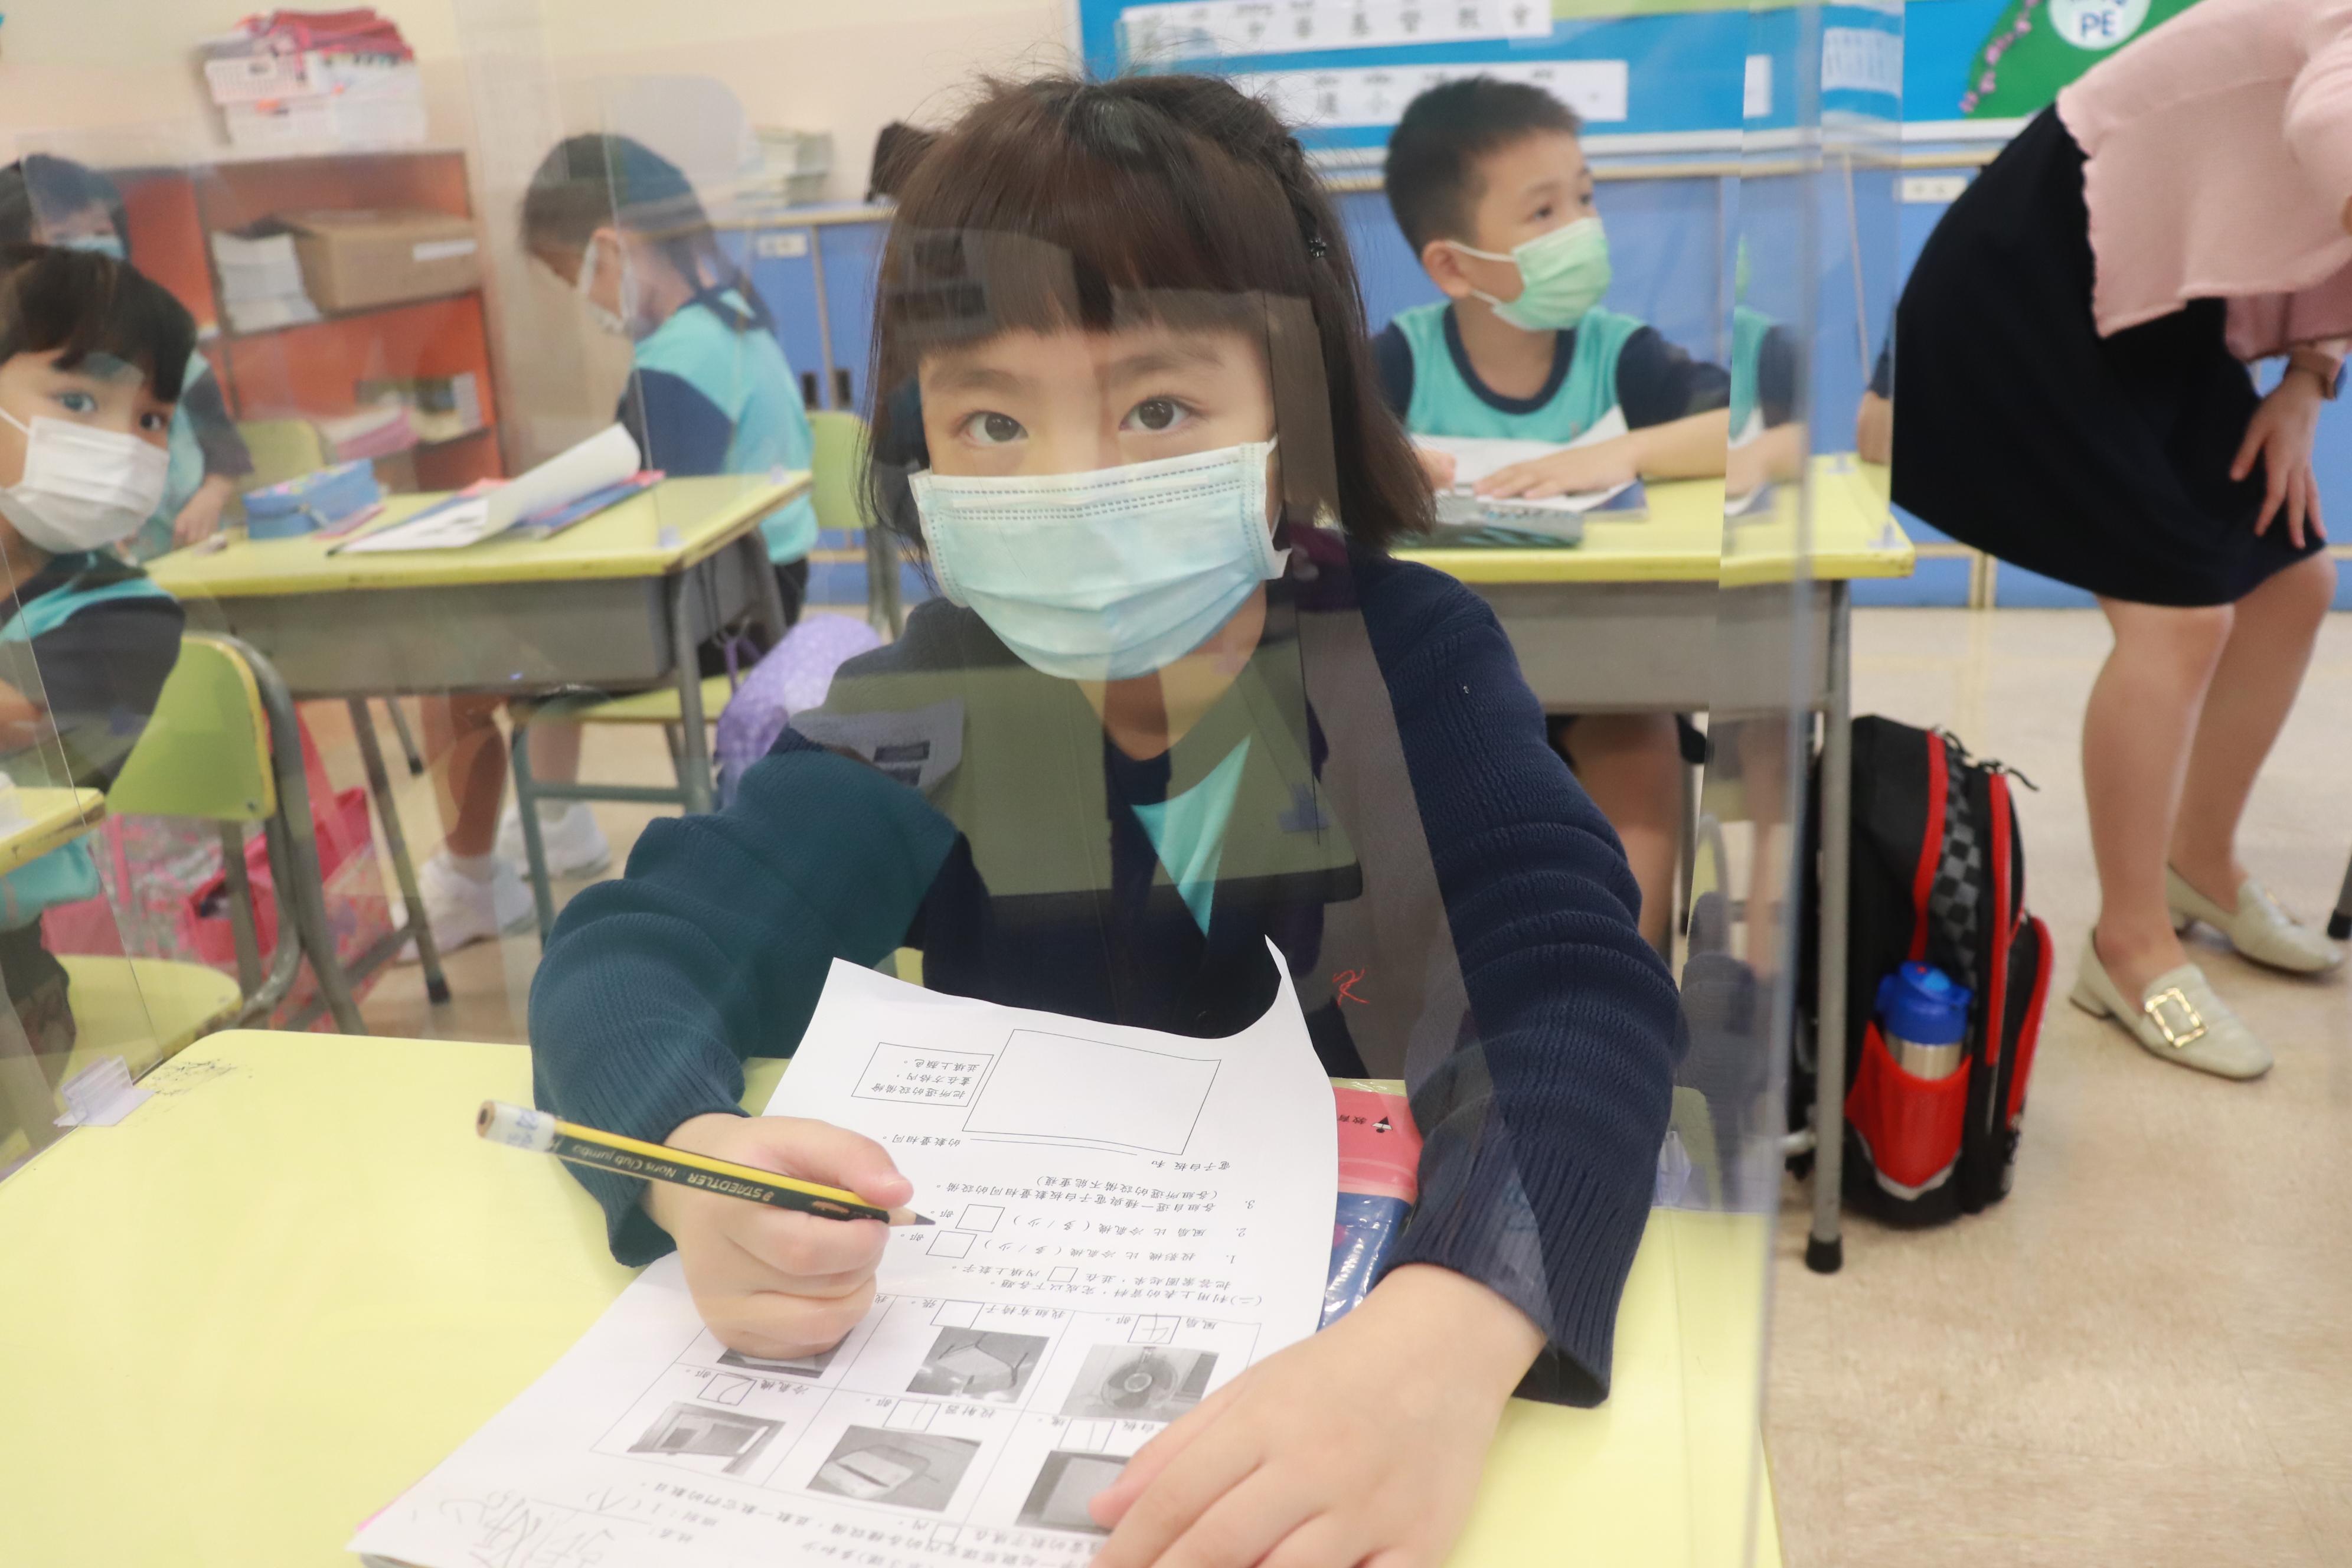 http://keito.school.hk/sites/default/files/img_6170.jpg